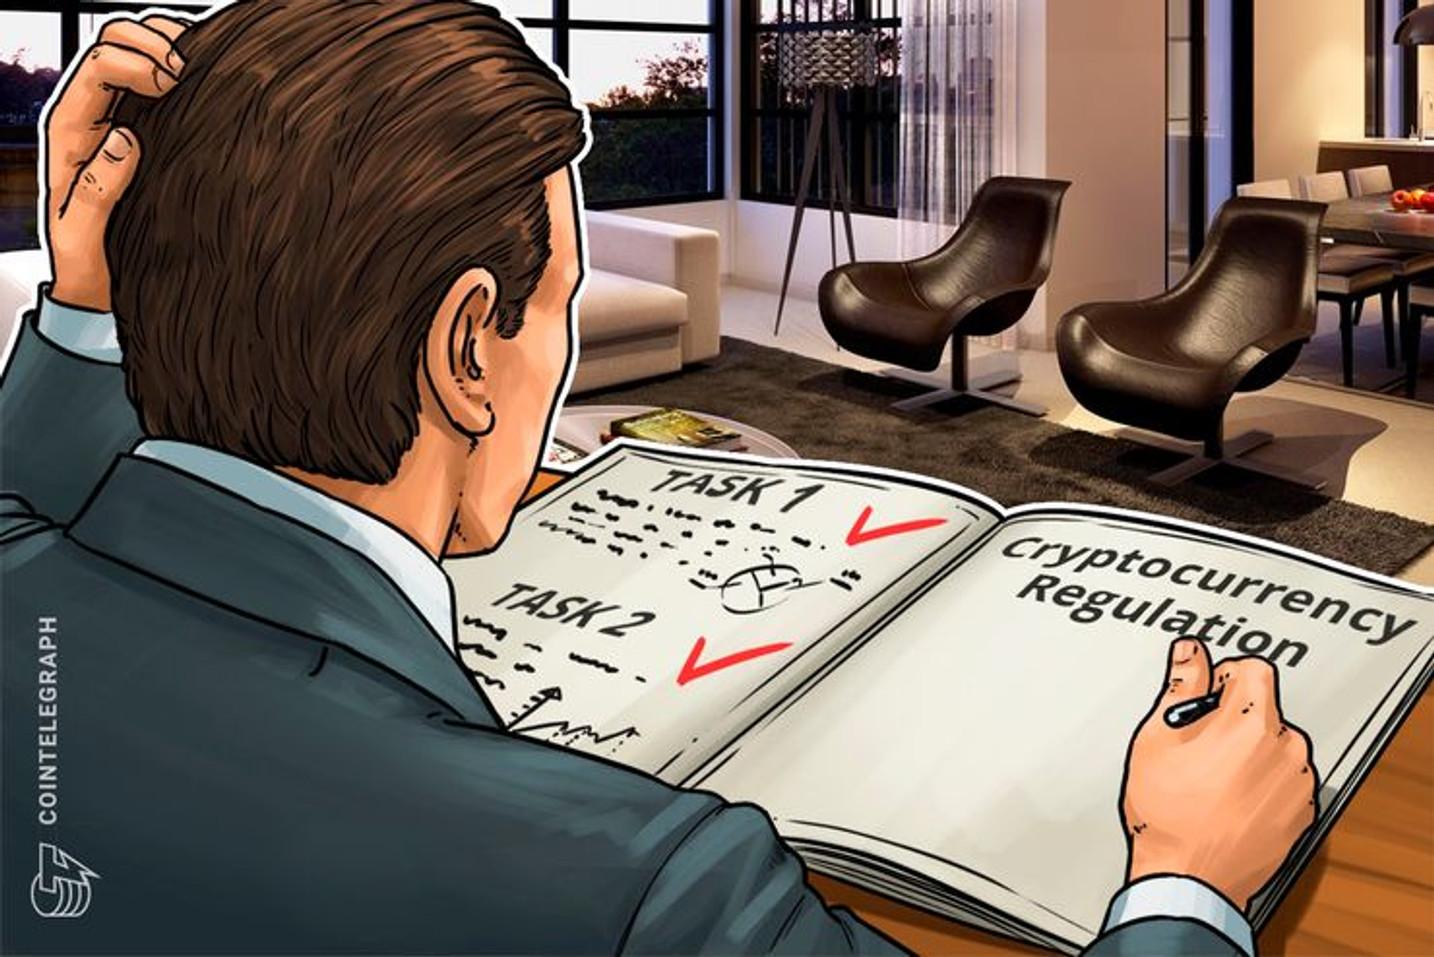 En España, un magistrado pide regulación de inversión en criptoactivos